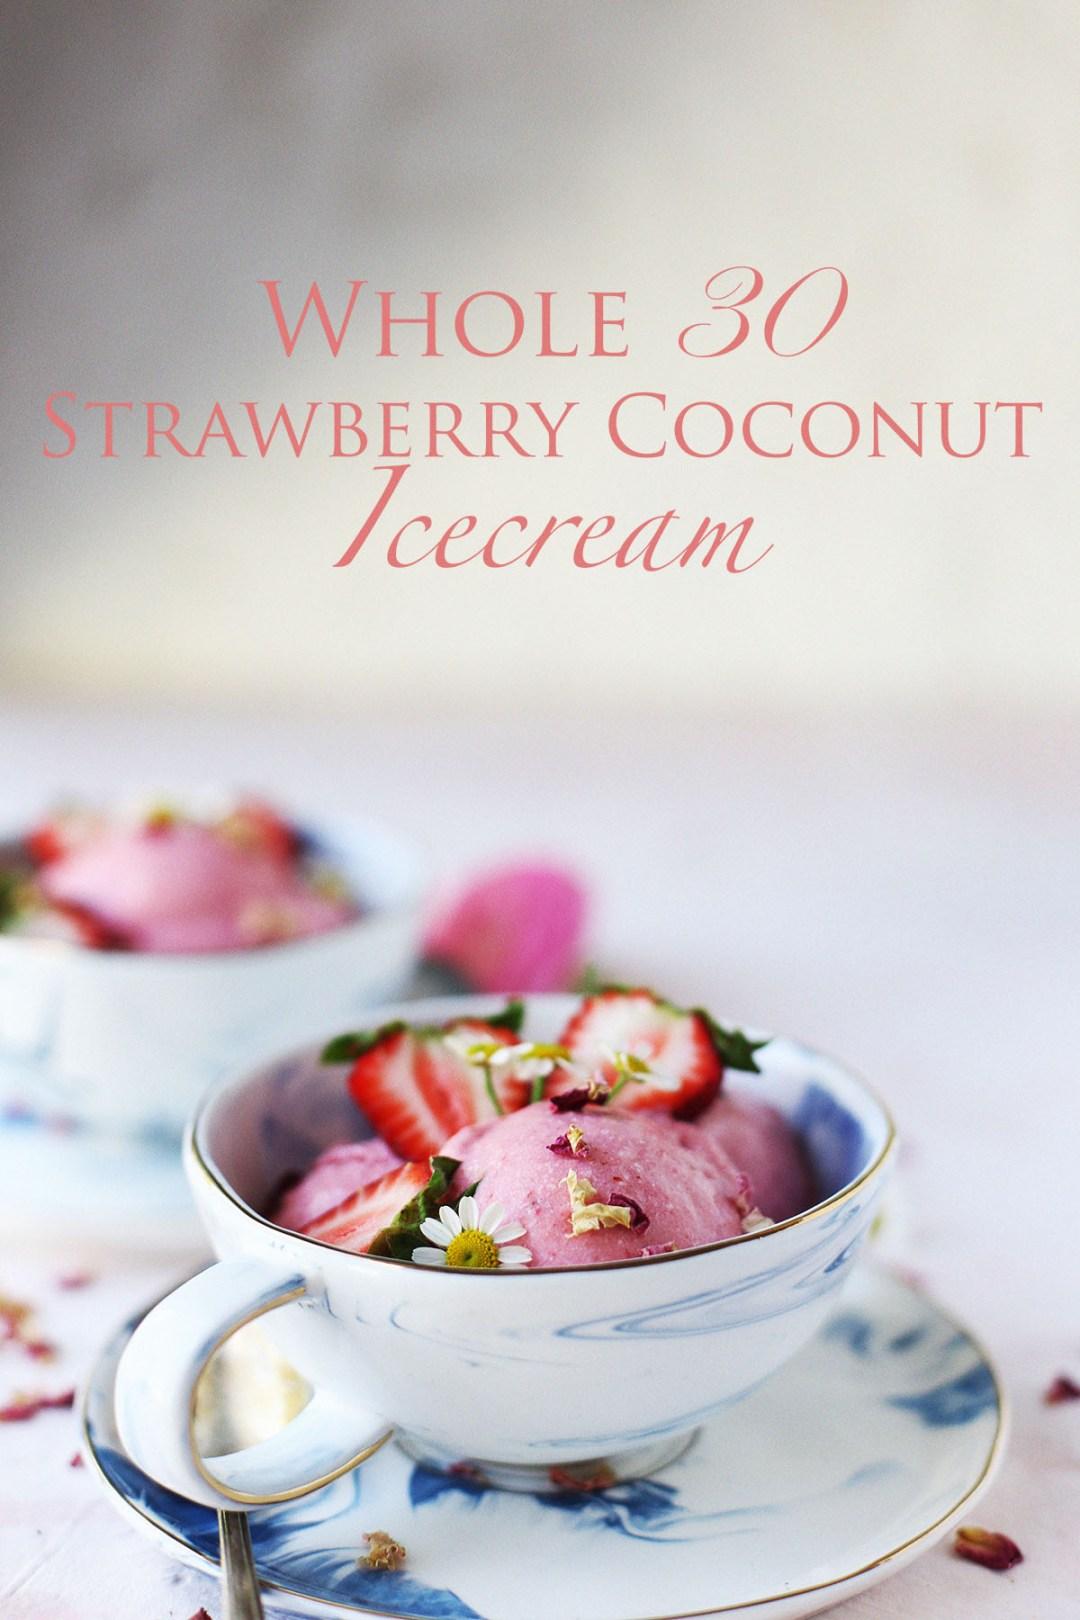 Whole 30 Strawberry Coconut Ice Cream